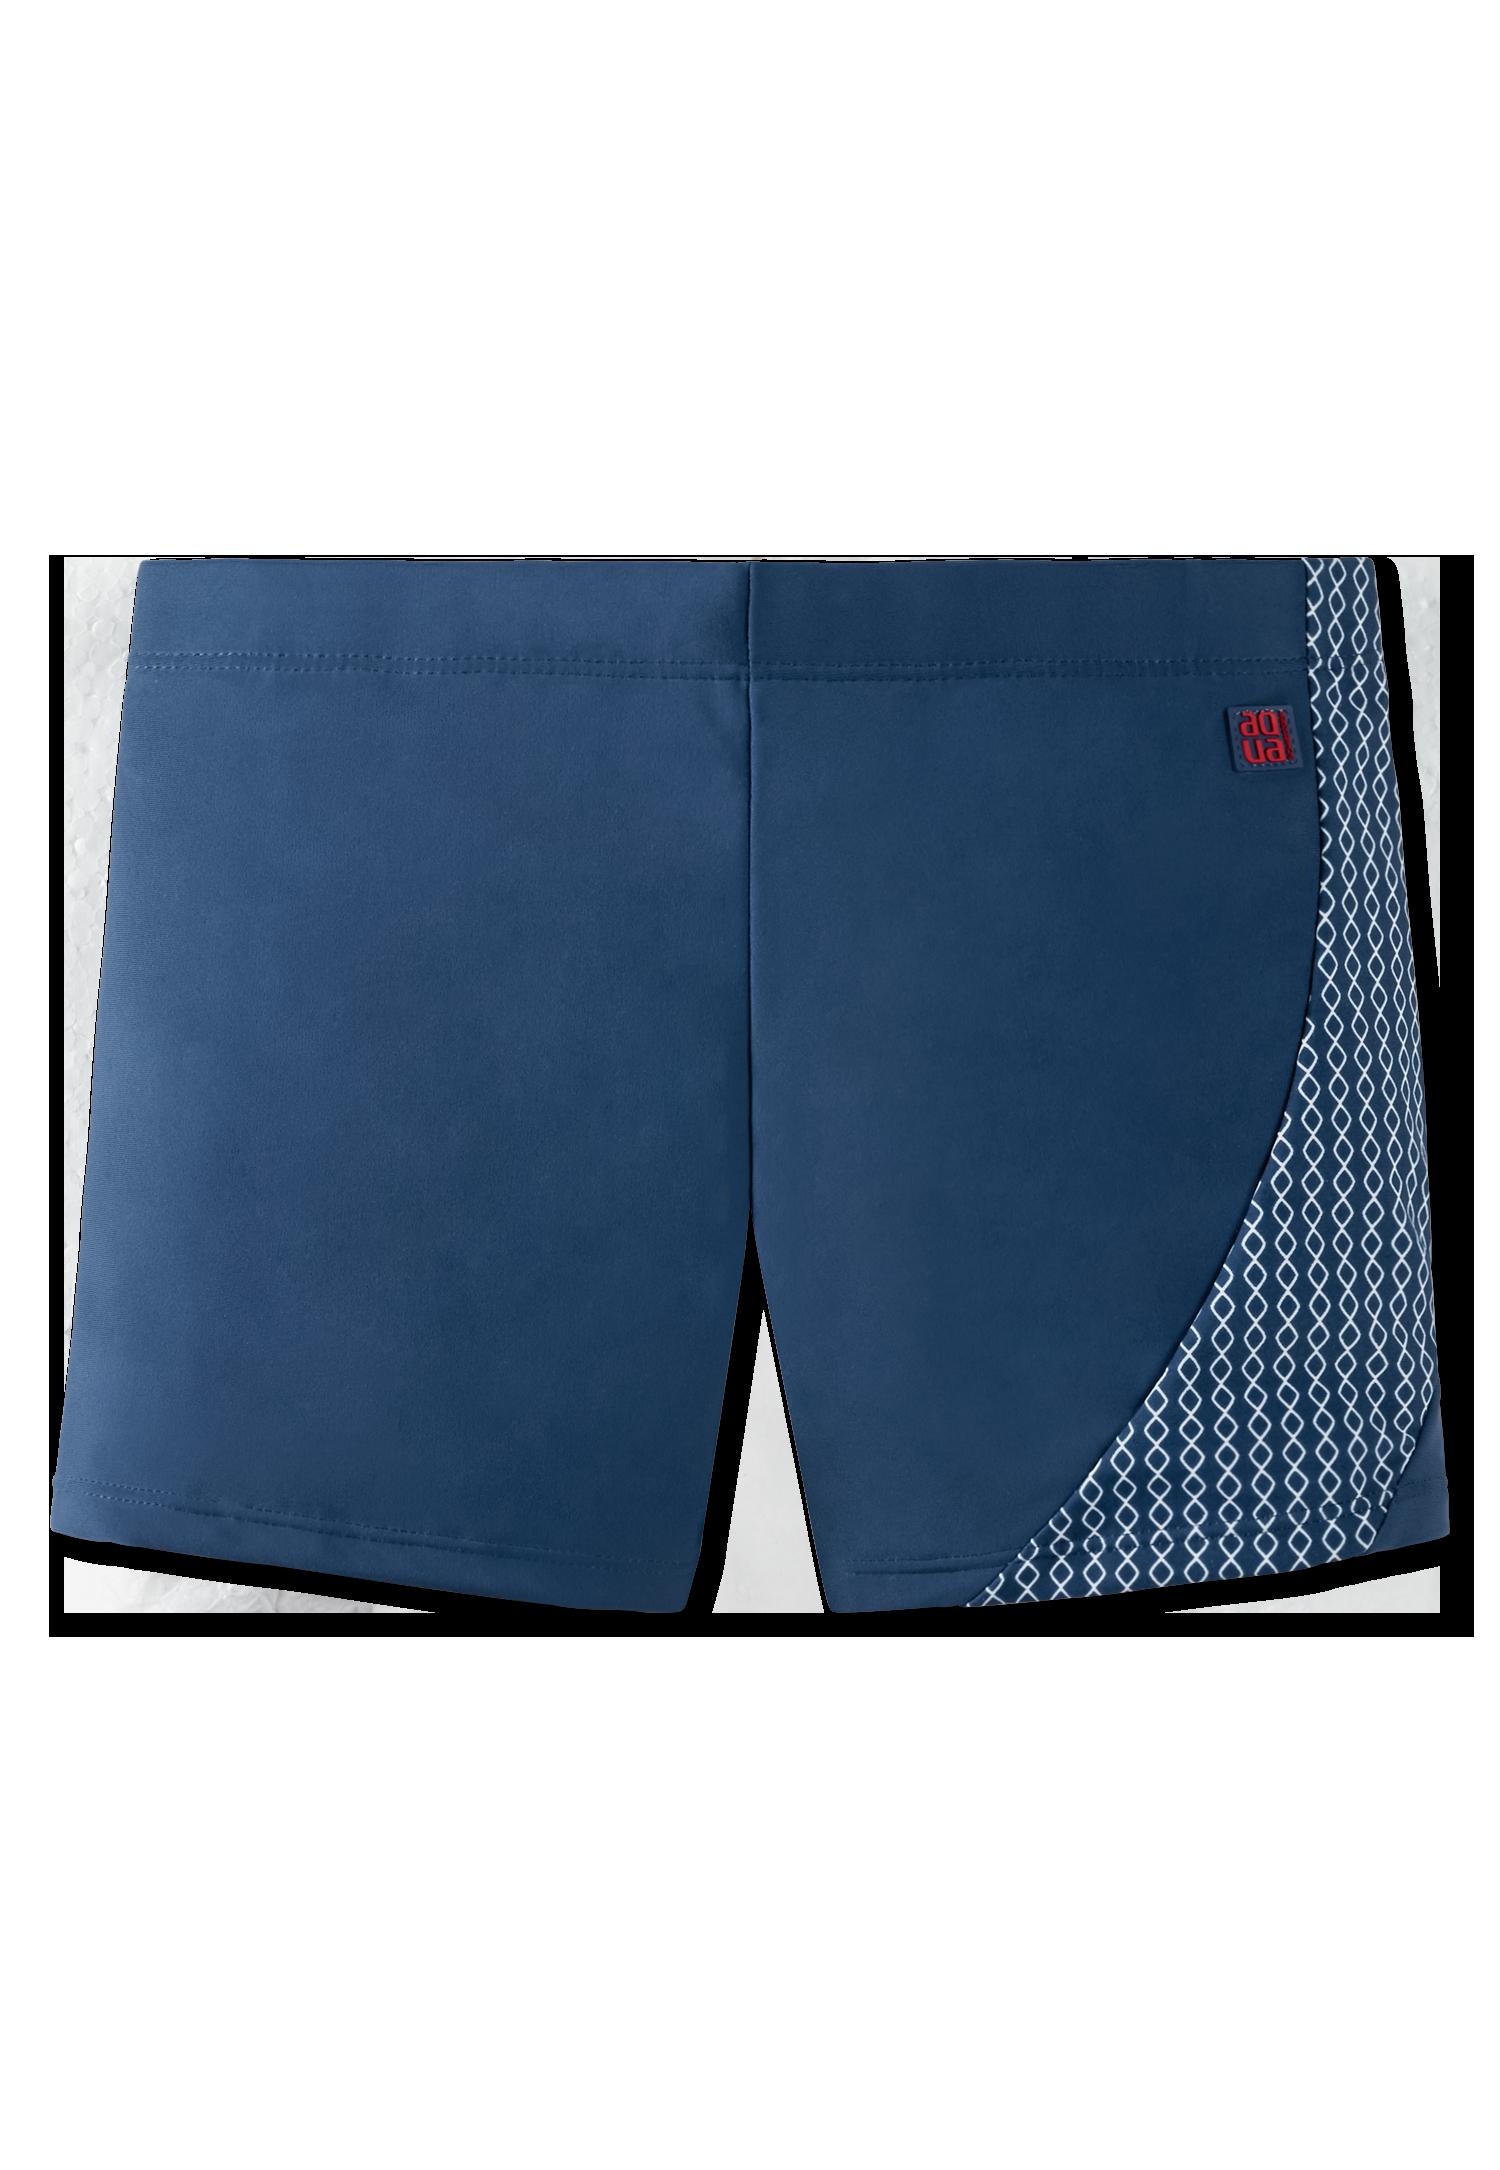 160622-824_front-Schiesser-Aqua-dunkelblaue-Bade-Retroshorts-fuer-Jungen.png